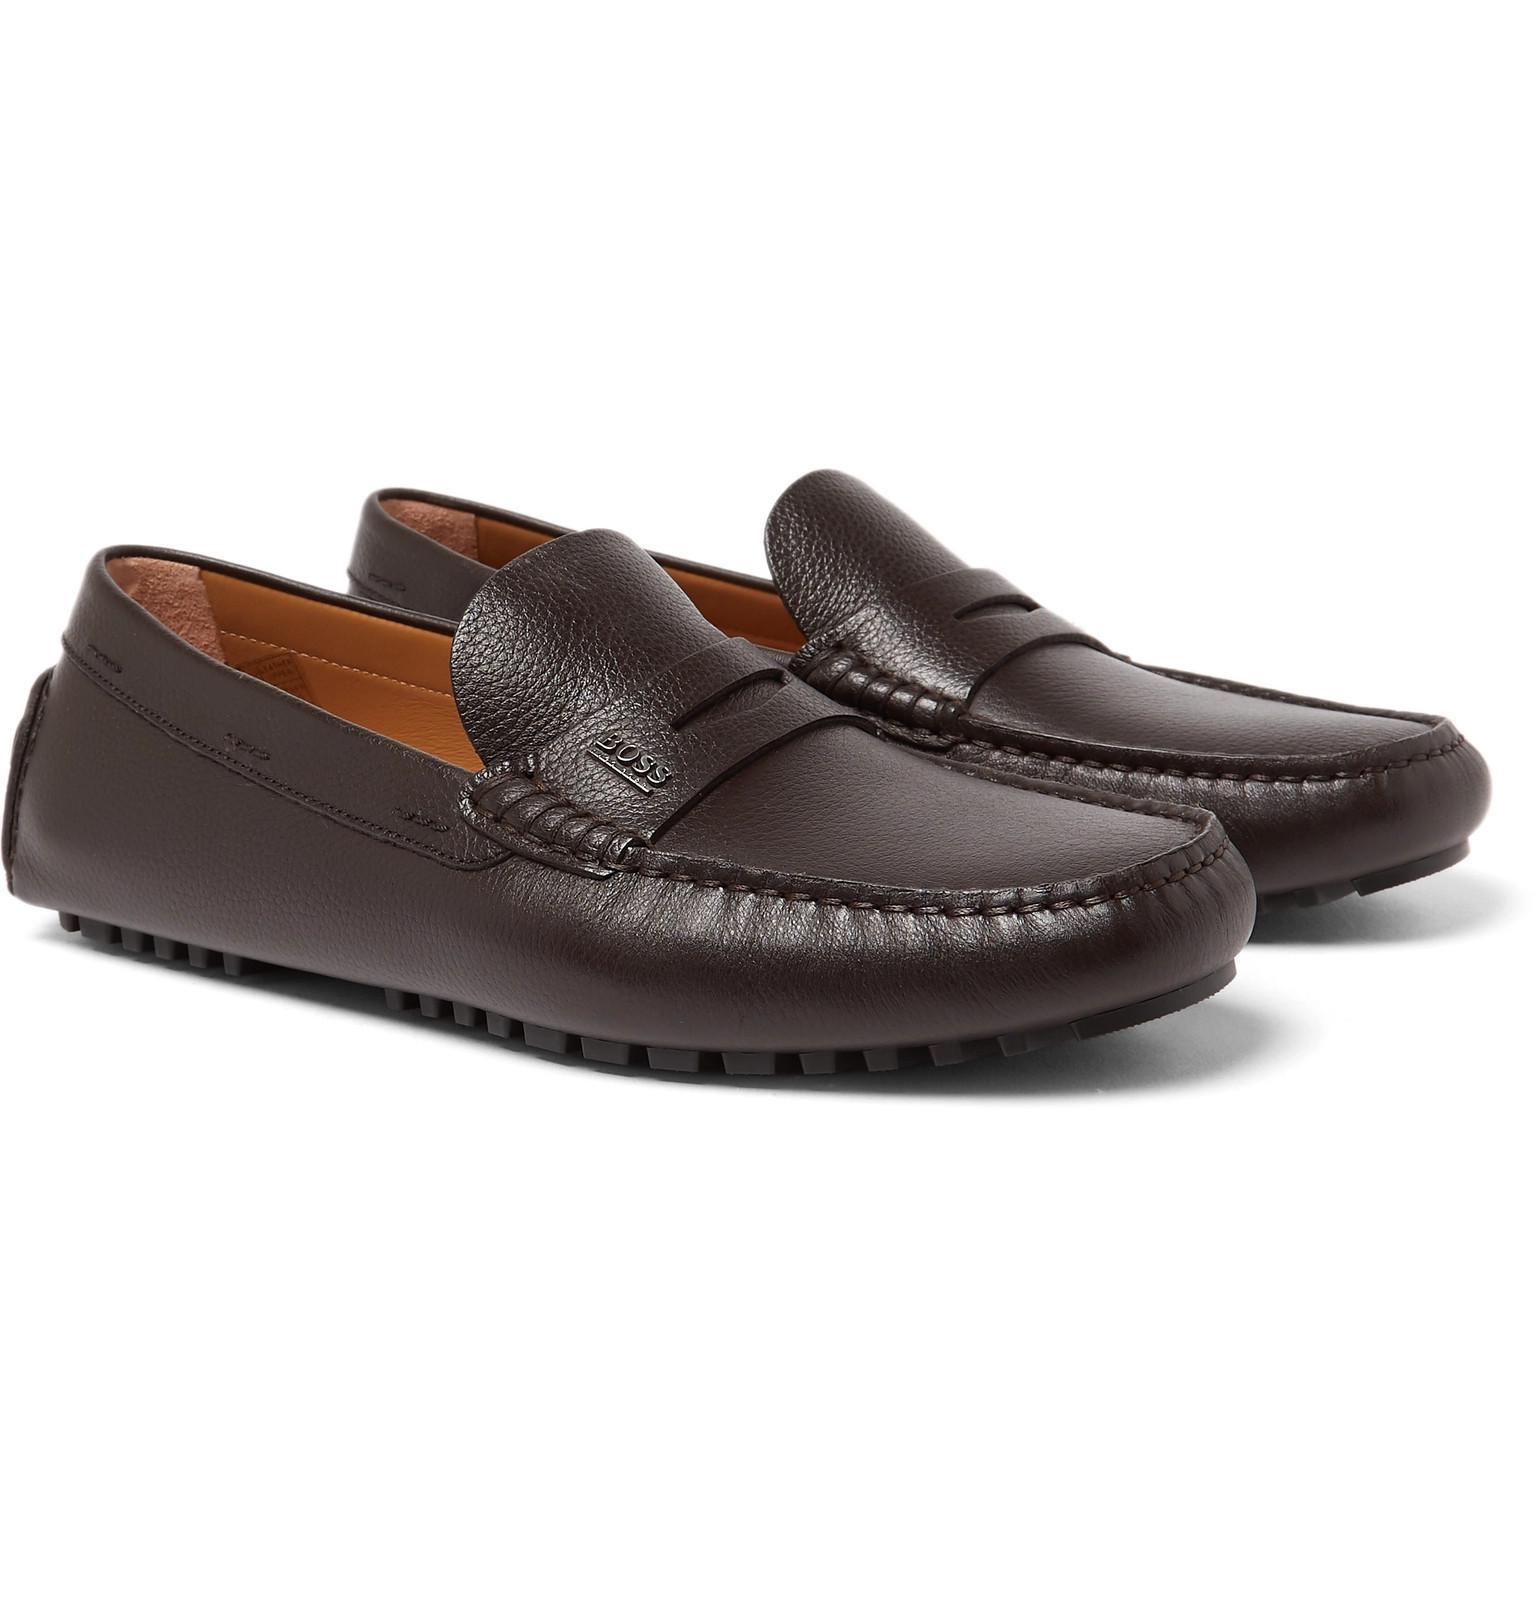 18109755bafa BOSS Full-grain Leather Driving Shoes in Brown for Men - Lyst